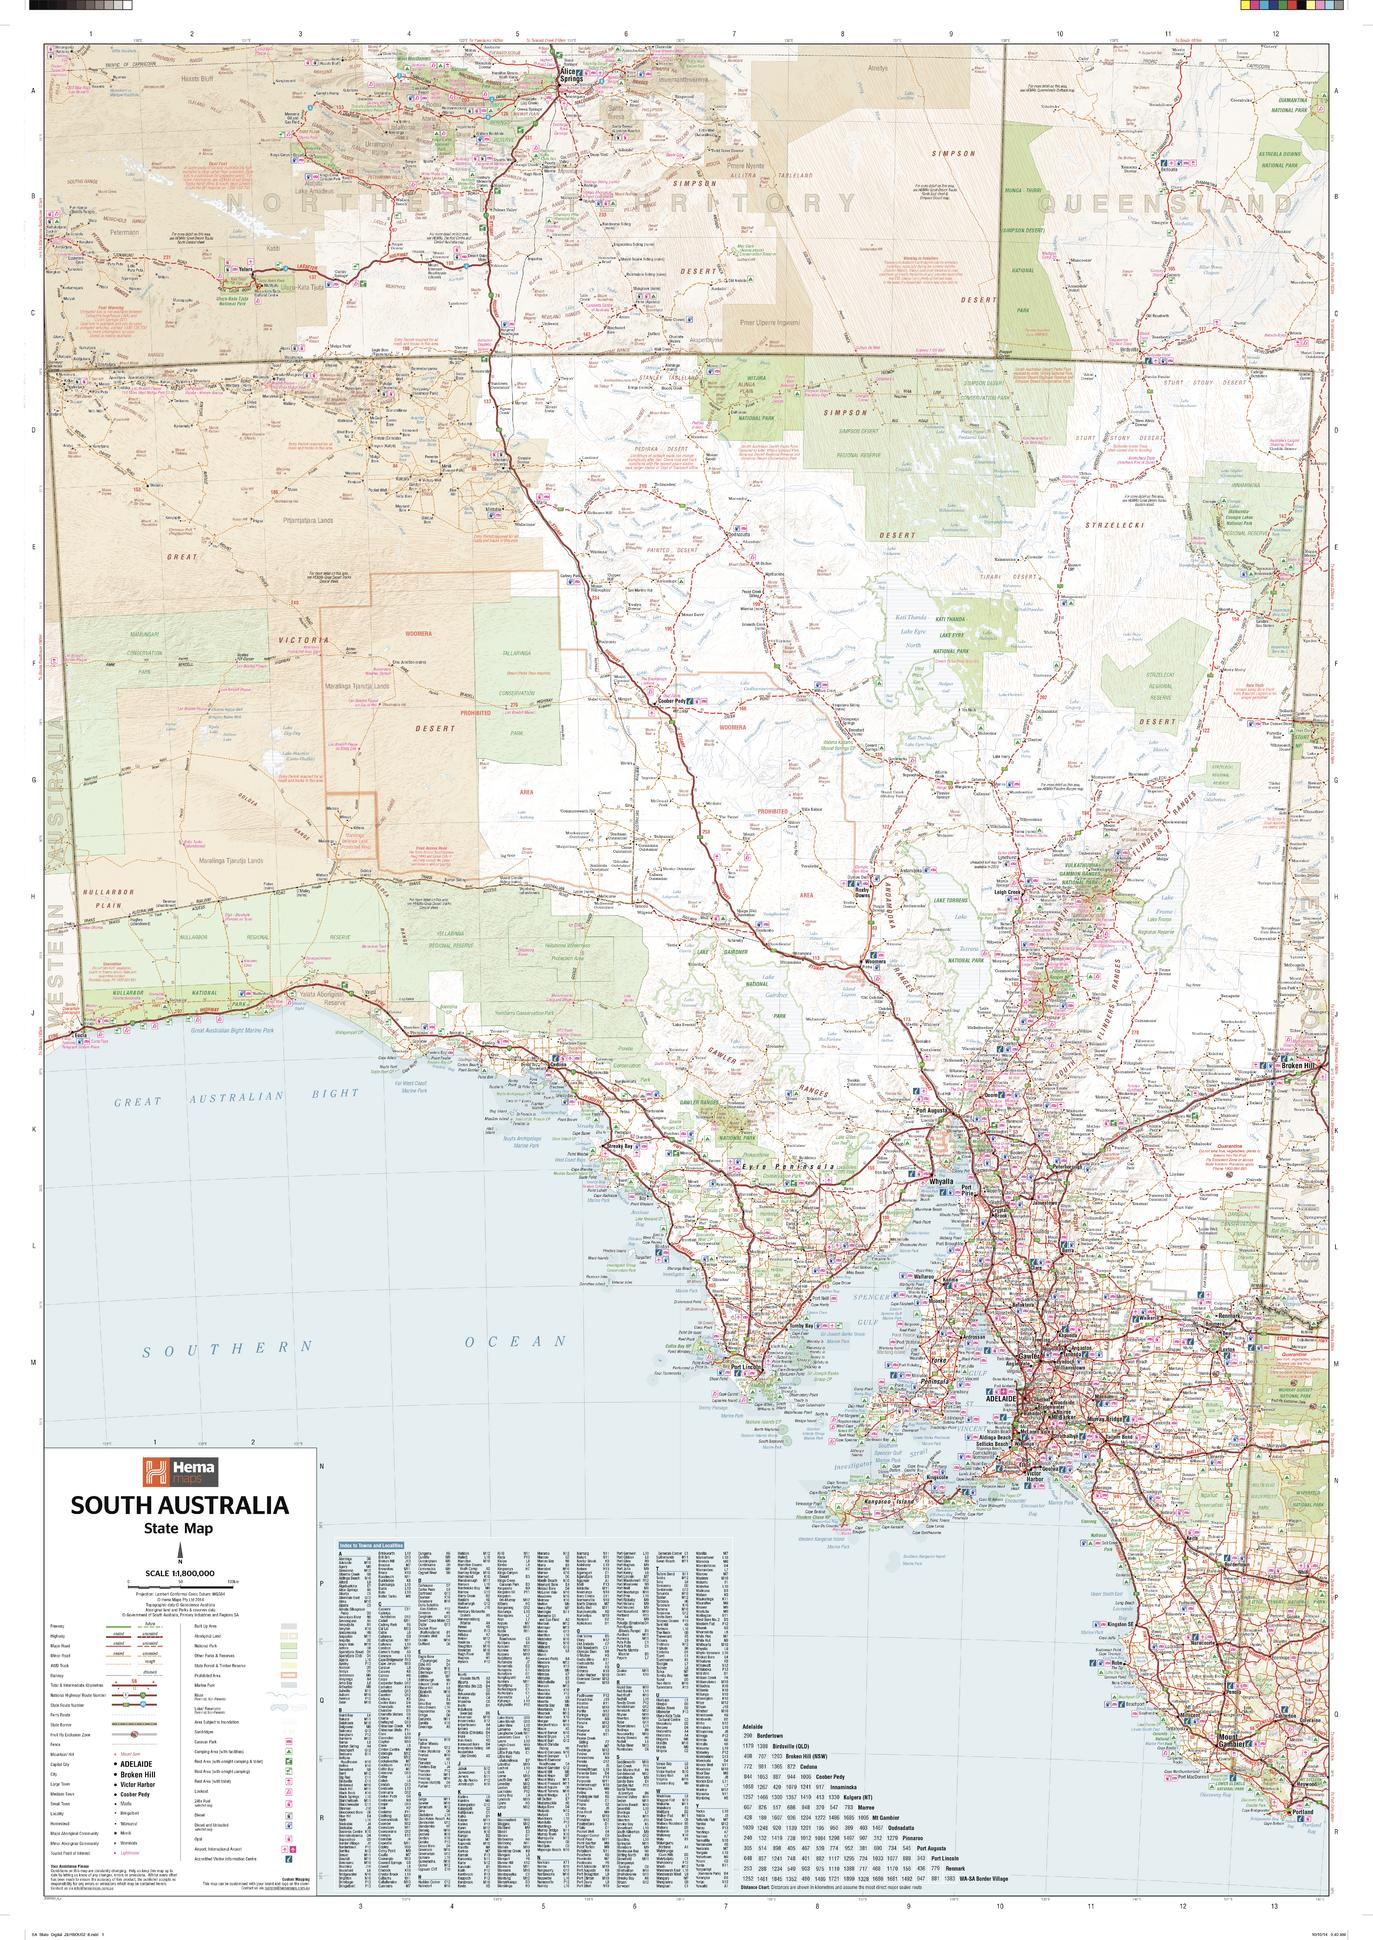 South Australia State